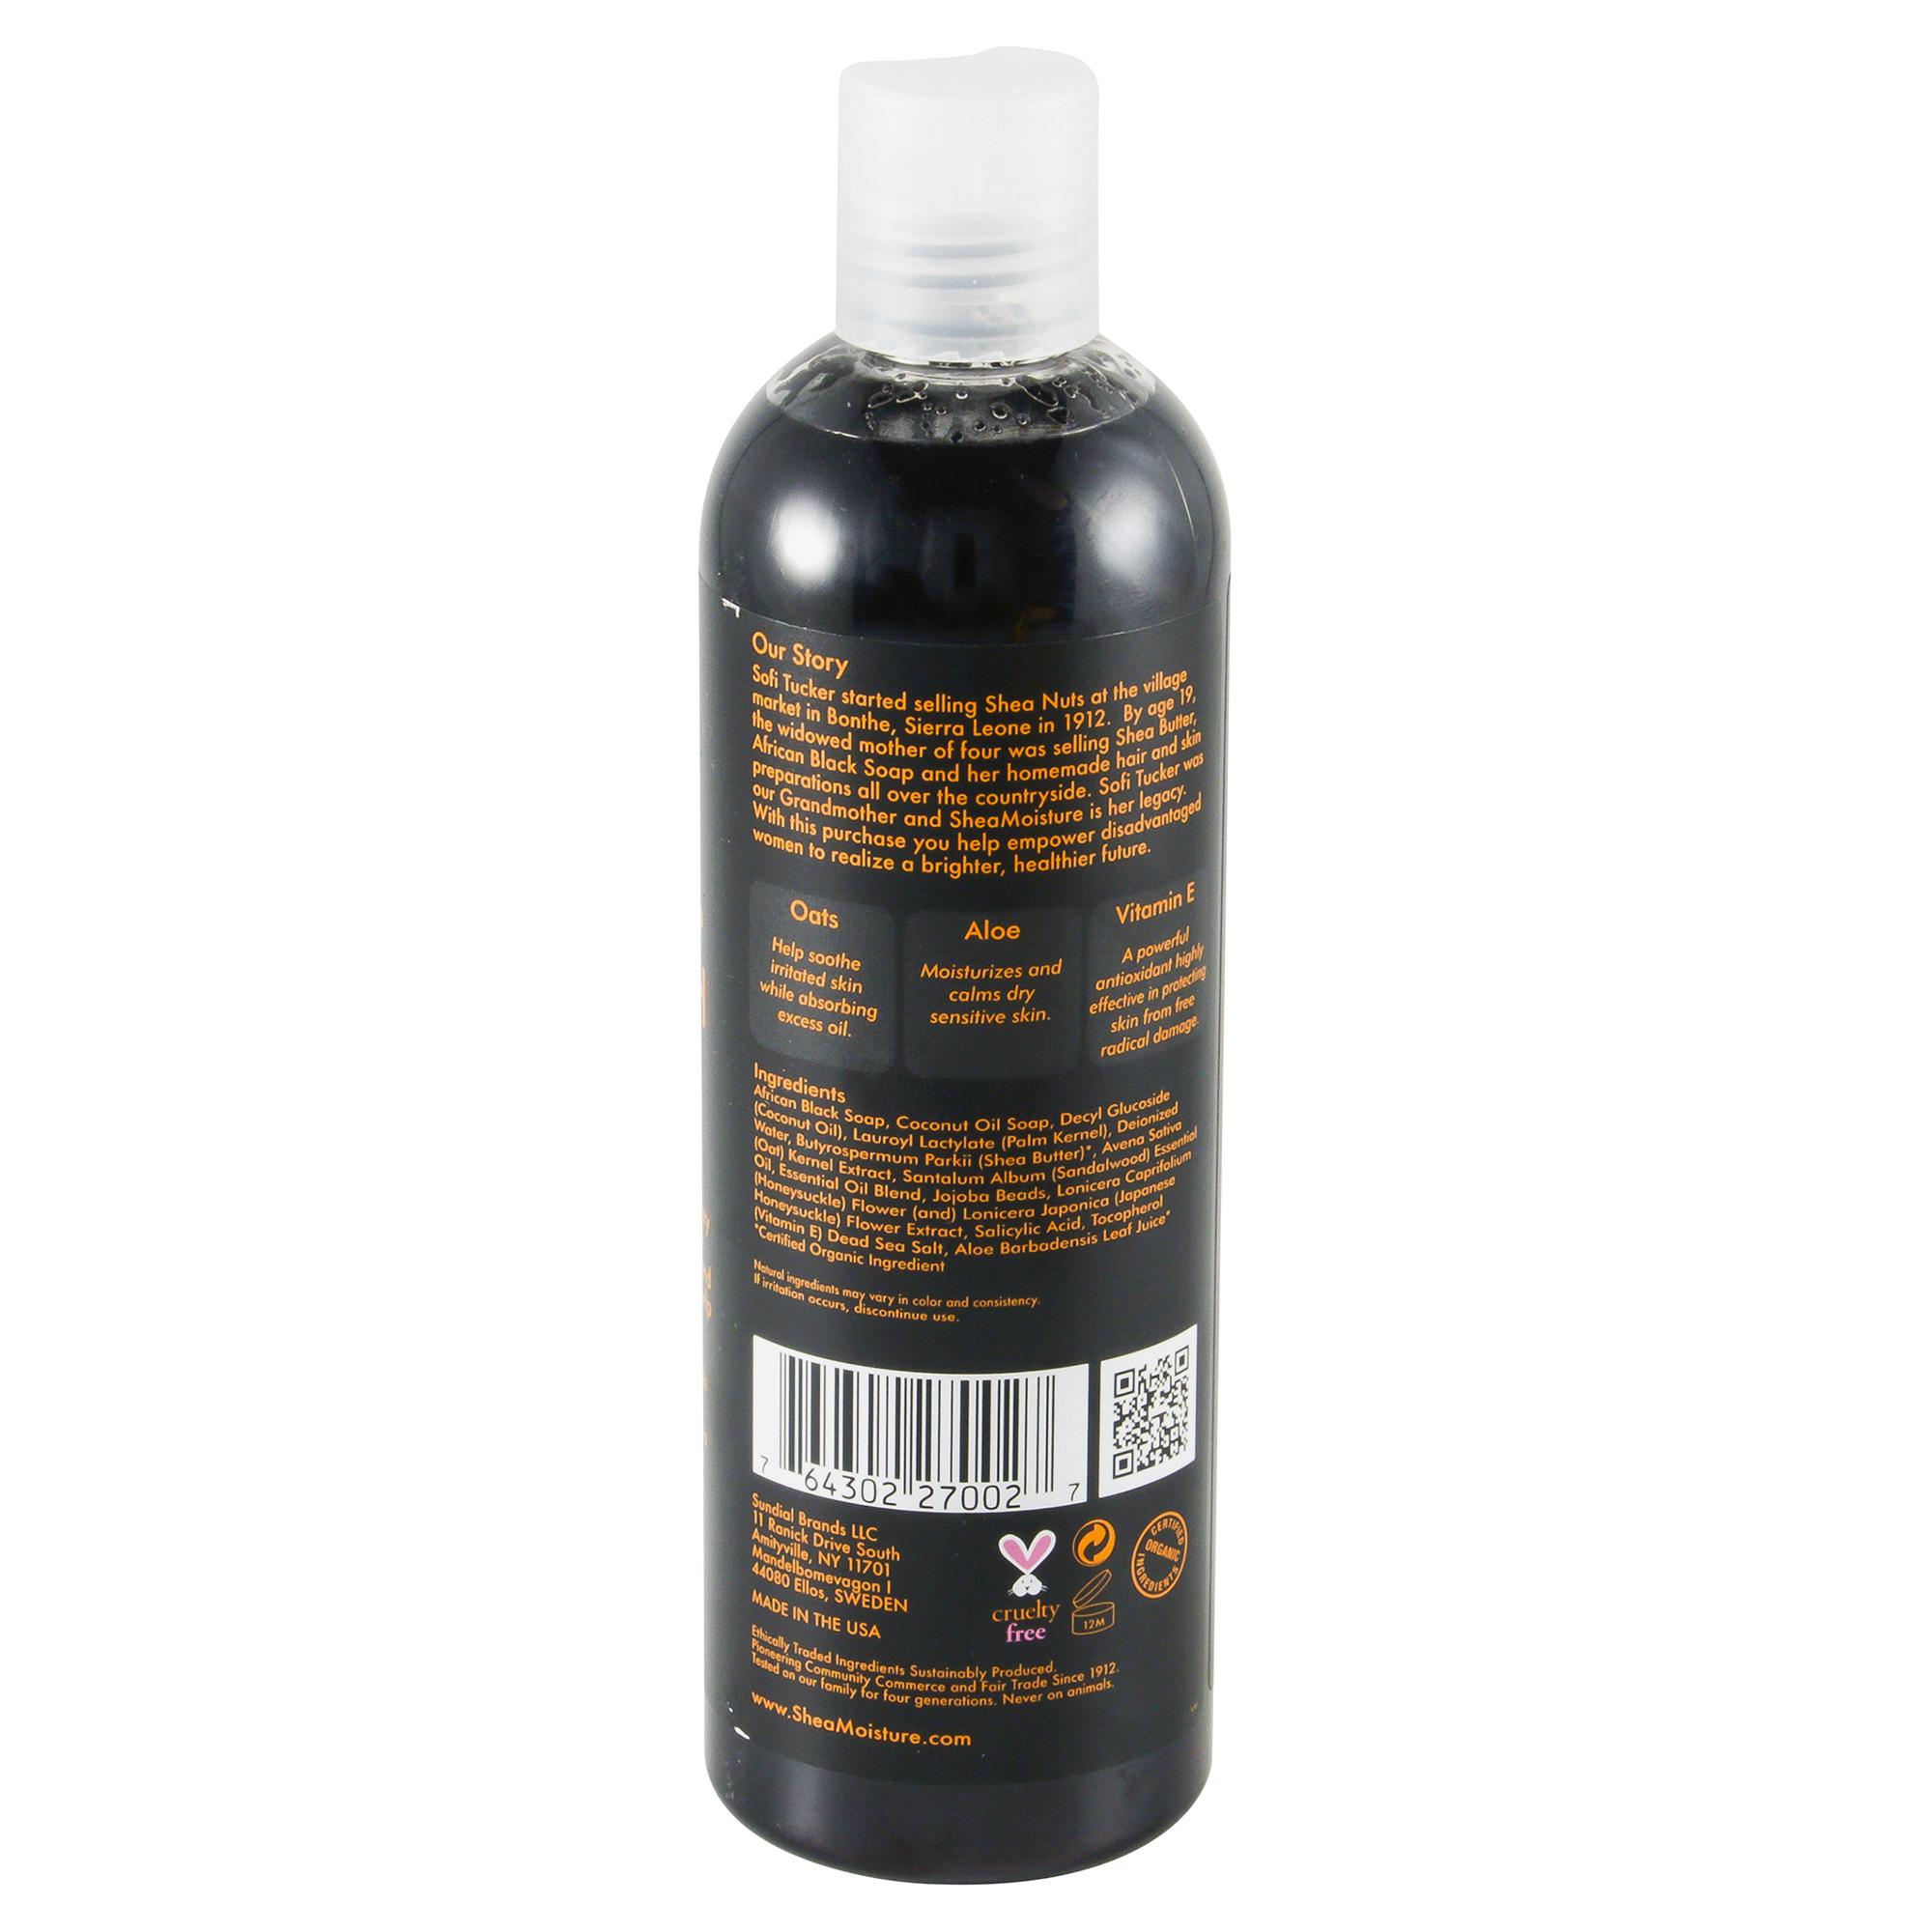 SheaMoisture African Black Soap Wash 13 oz | Meijer.com on